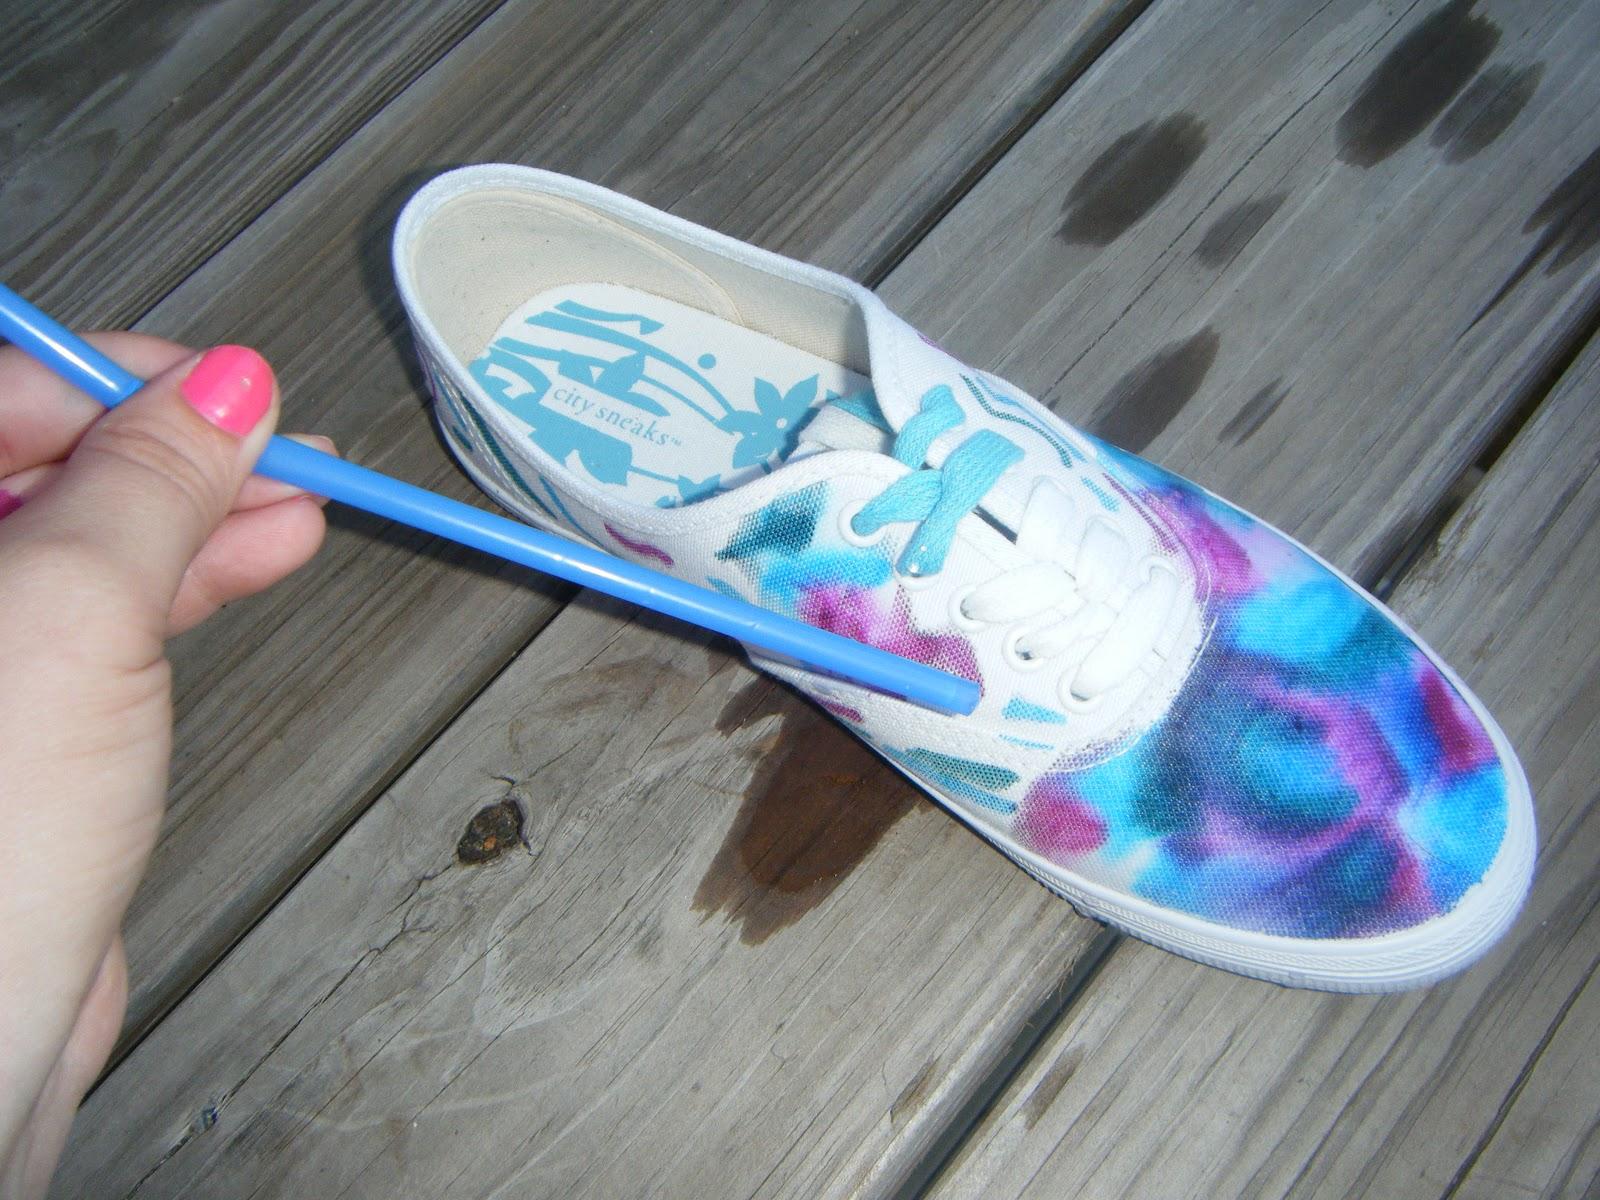 fb83d610f8 Tie dye shoes diy - woltermanortho.com